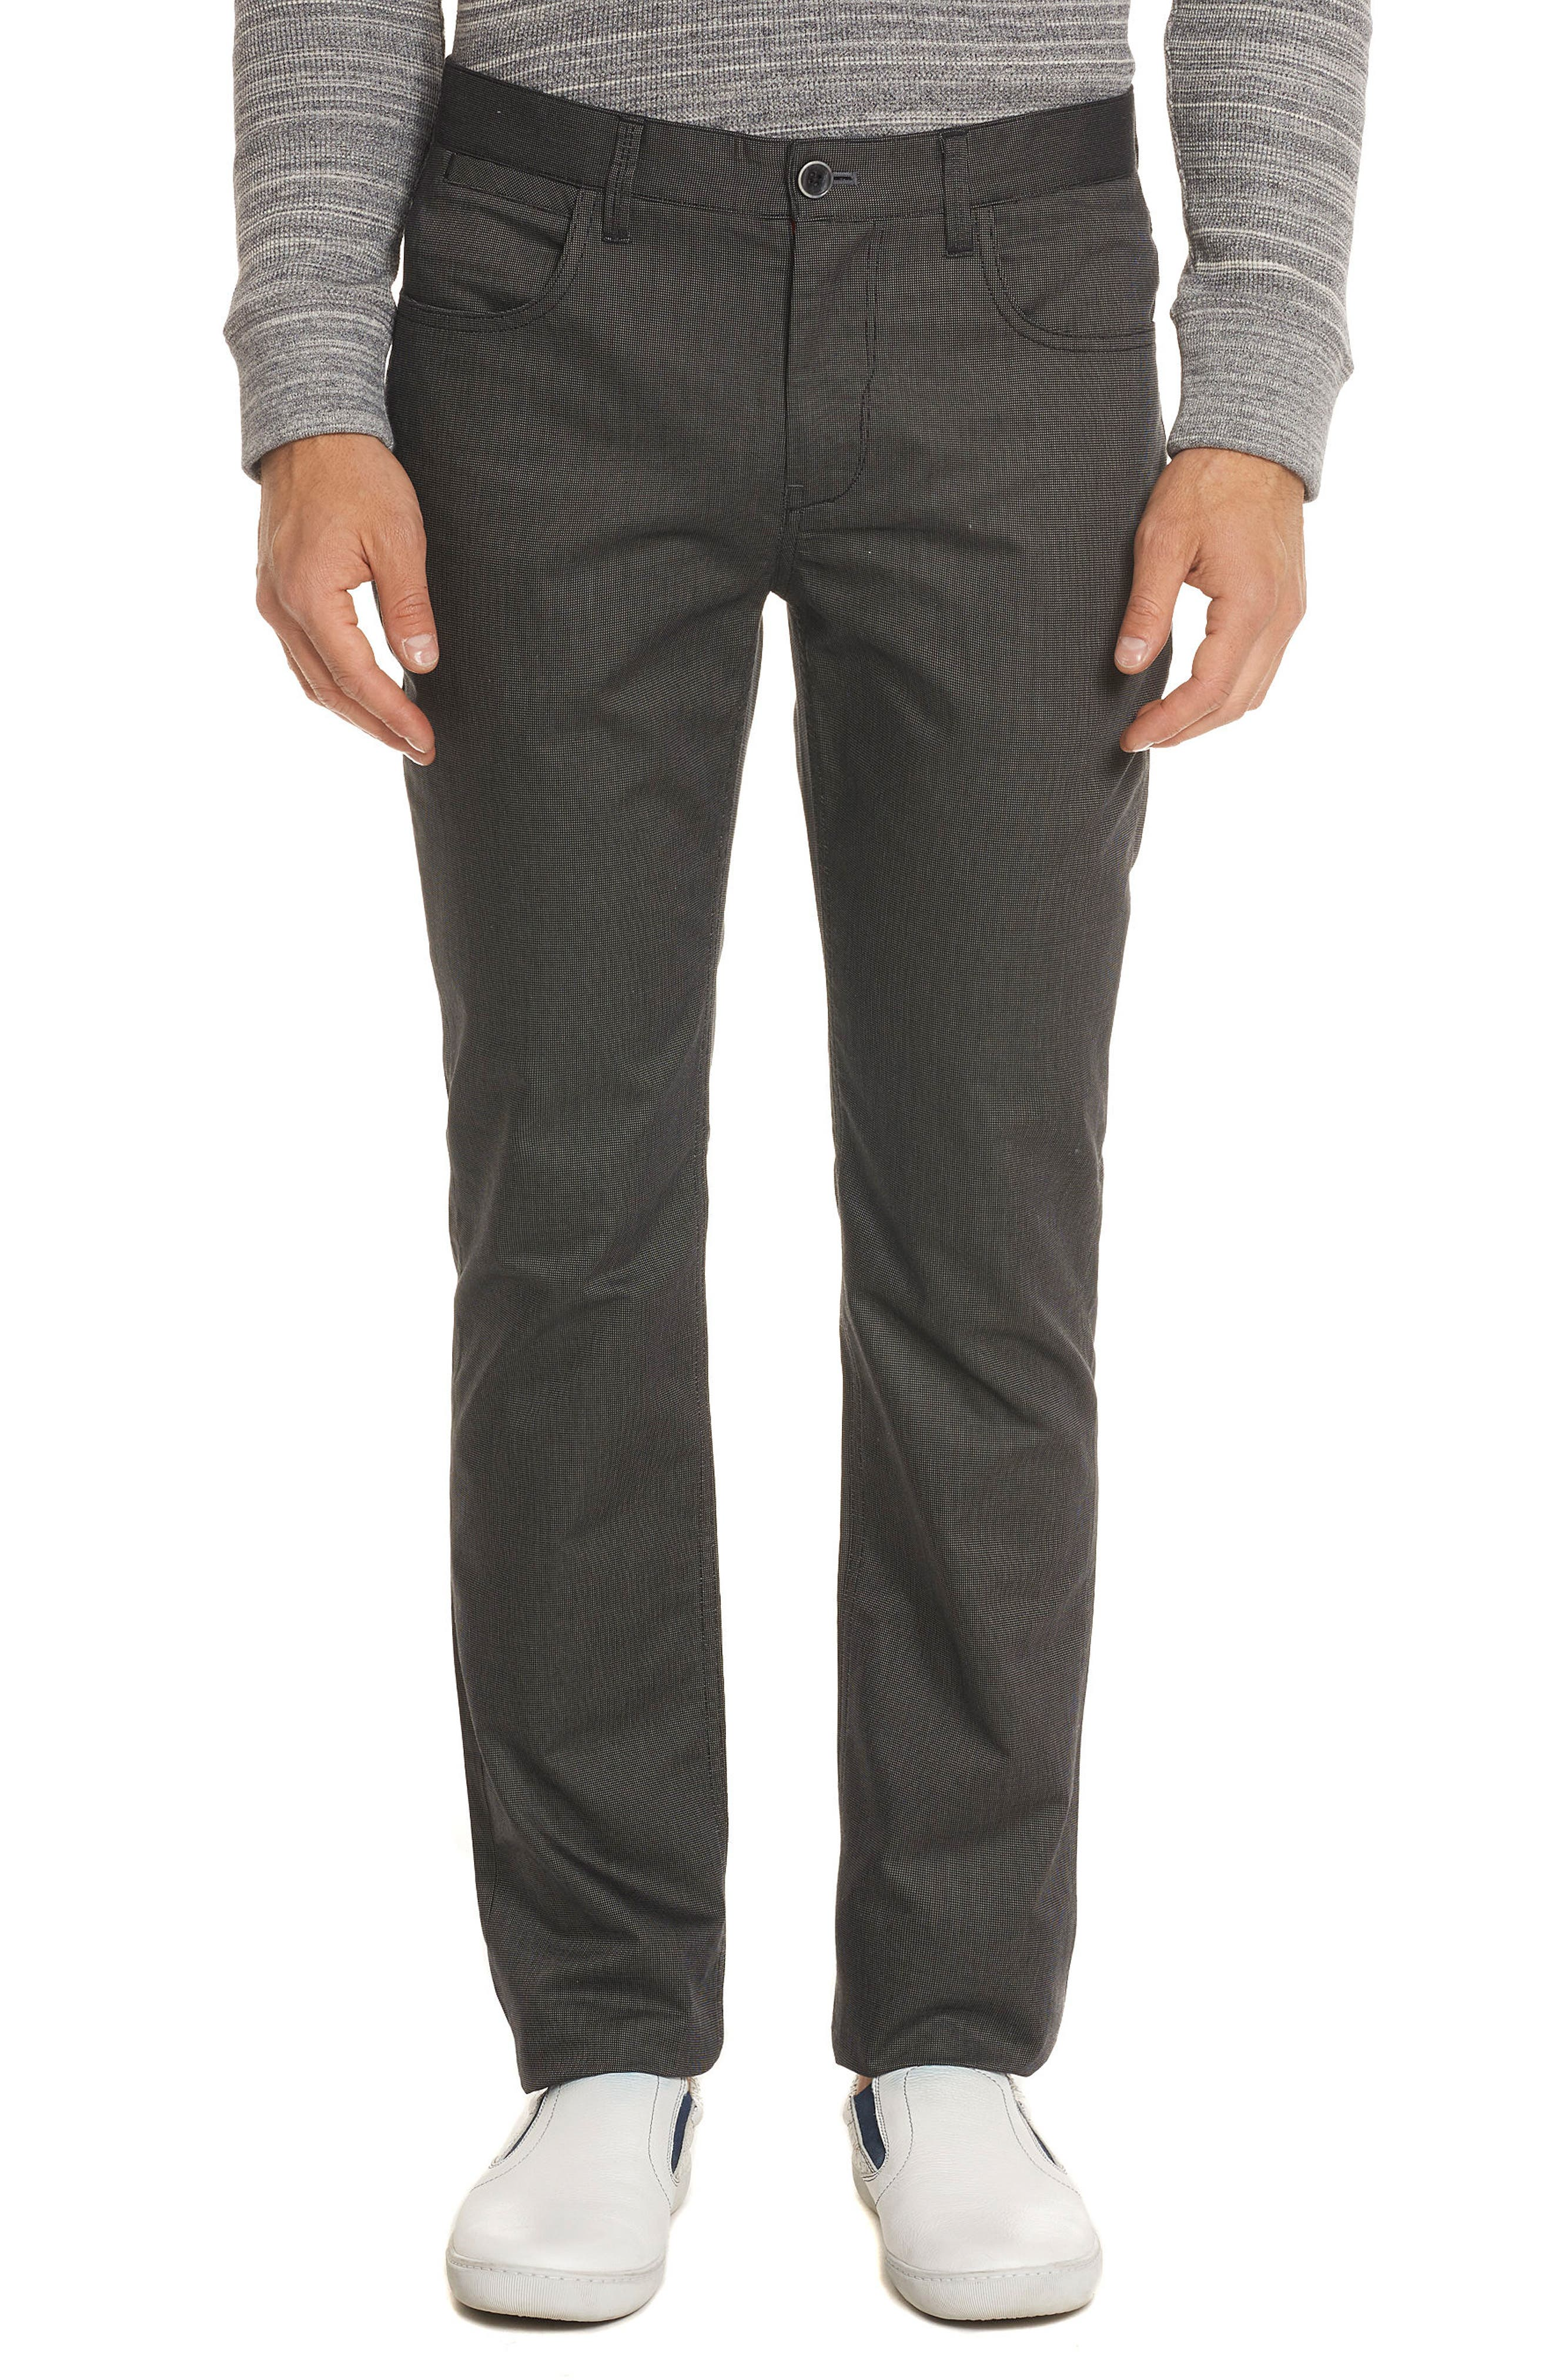 Robert Graham Prio Tailored Fit Pants